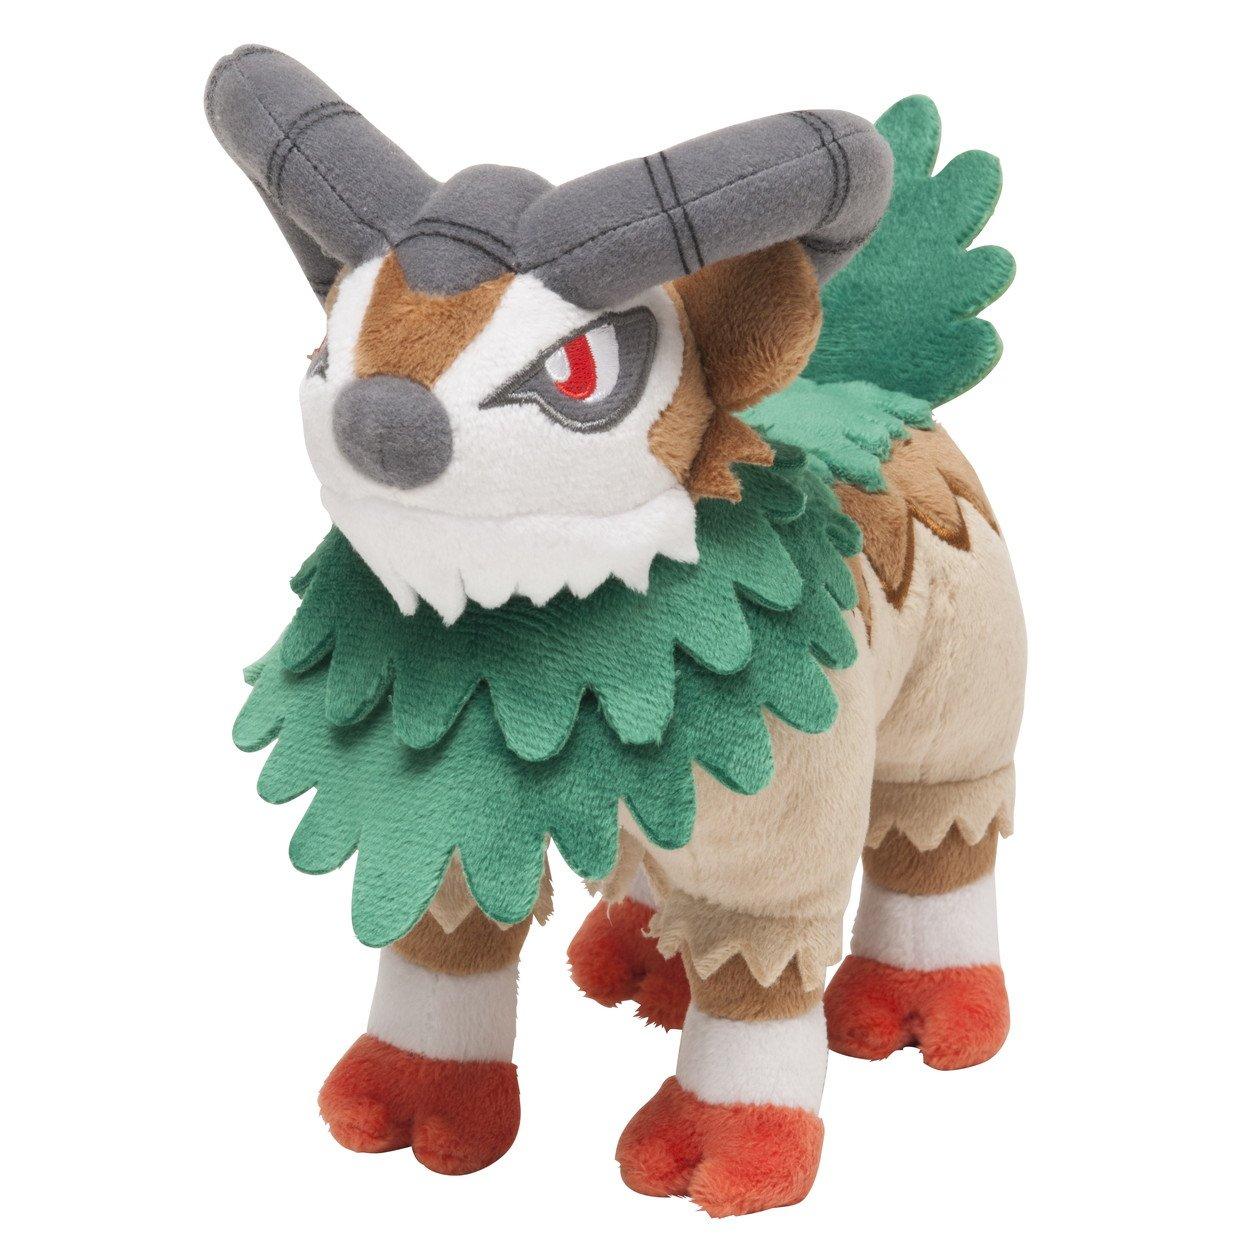 Amazon.com: Pok?mon Center Original Products Stuffed toy Gogoat: Toys & Games